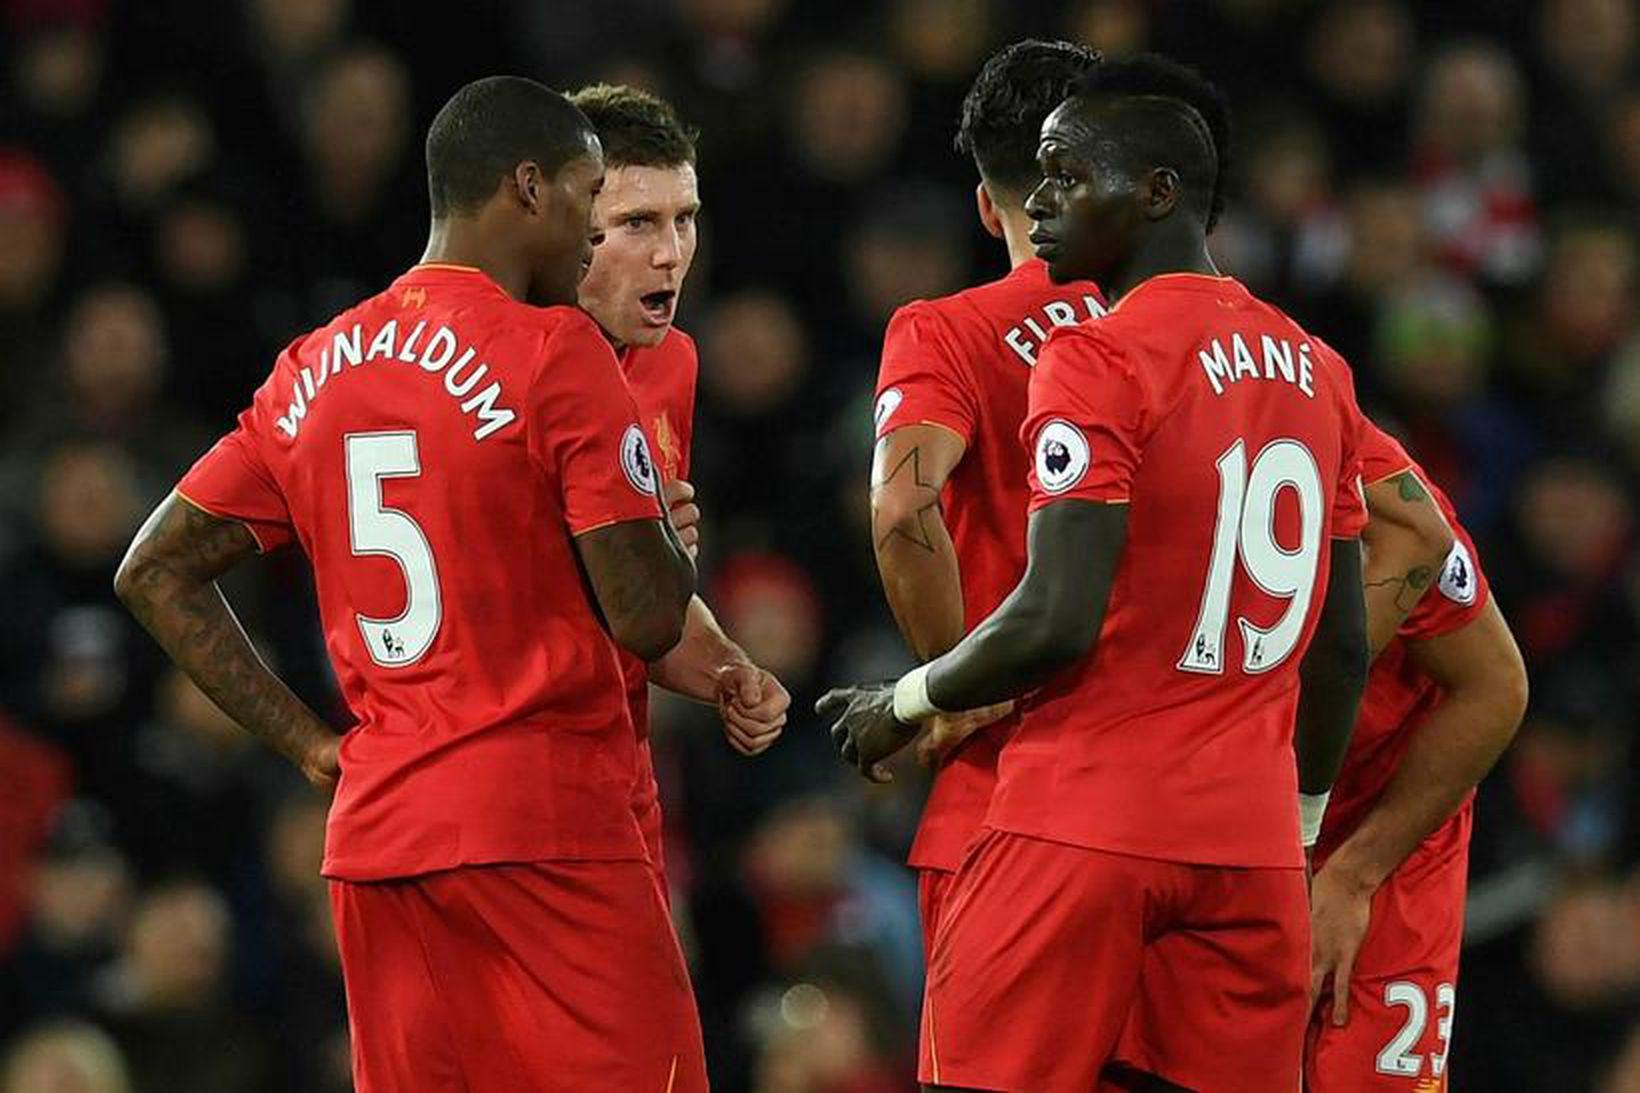 Leikmenn Liverpool fagna marki.